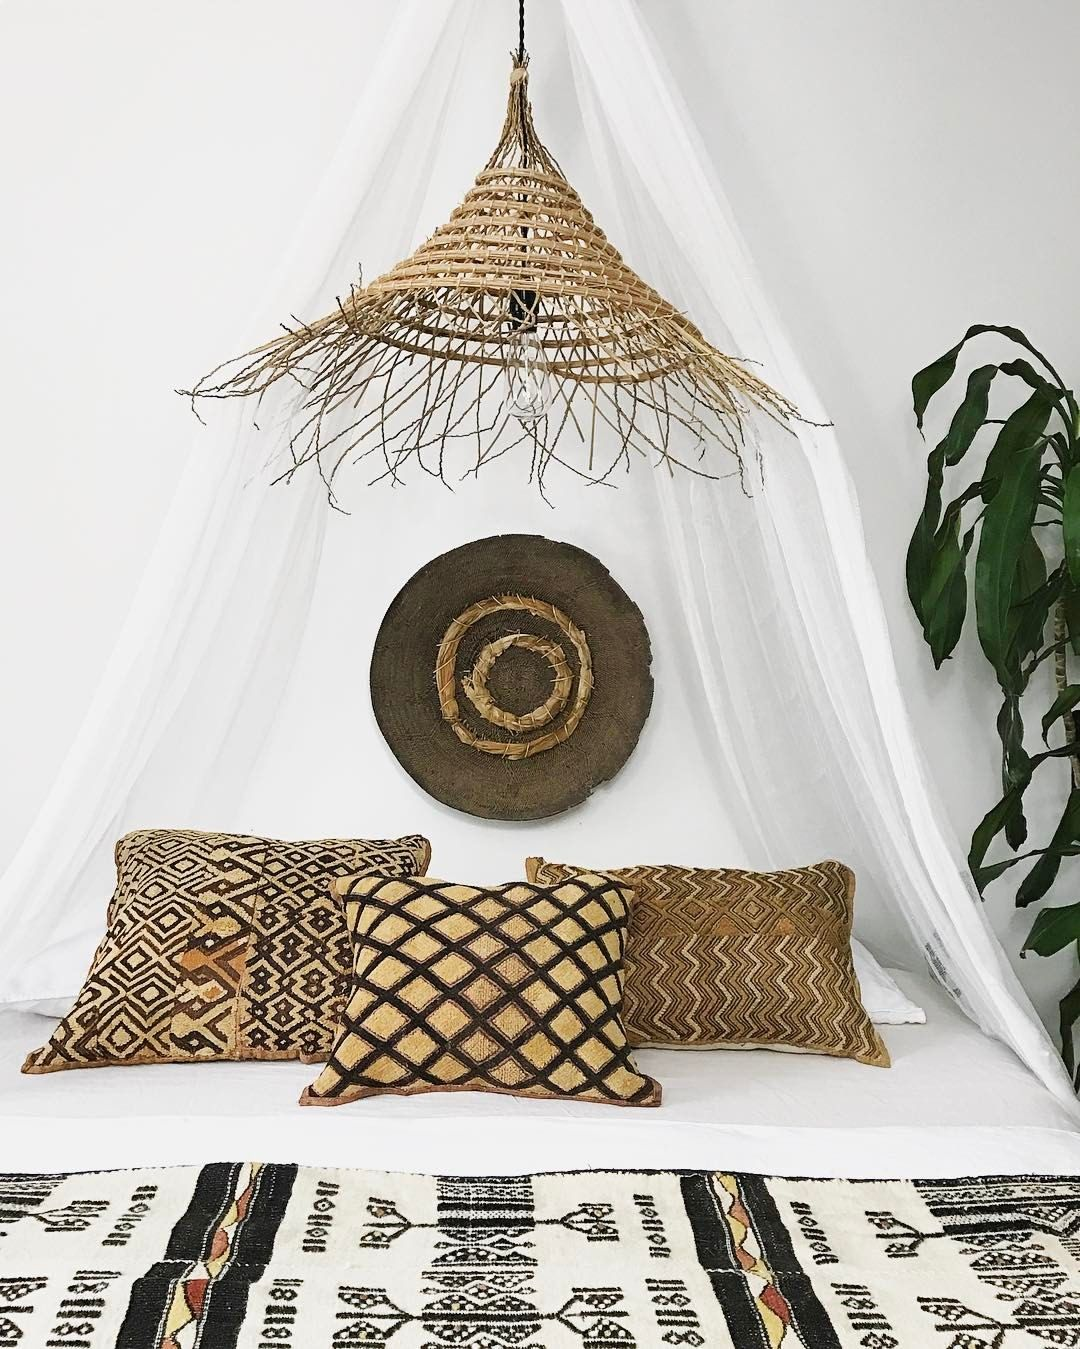 210 African Inspired Home Decor Ideas Decor African Decor African Inspired